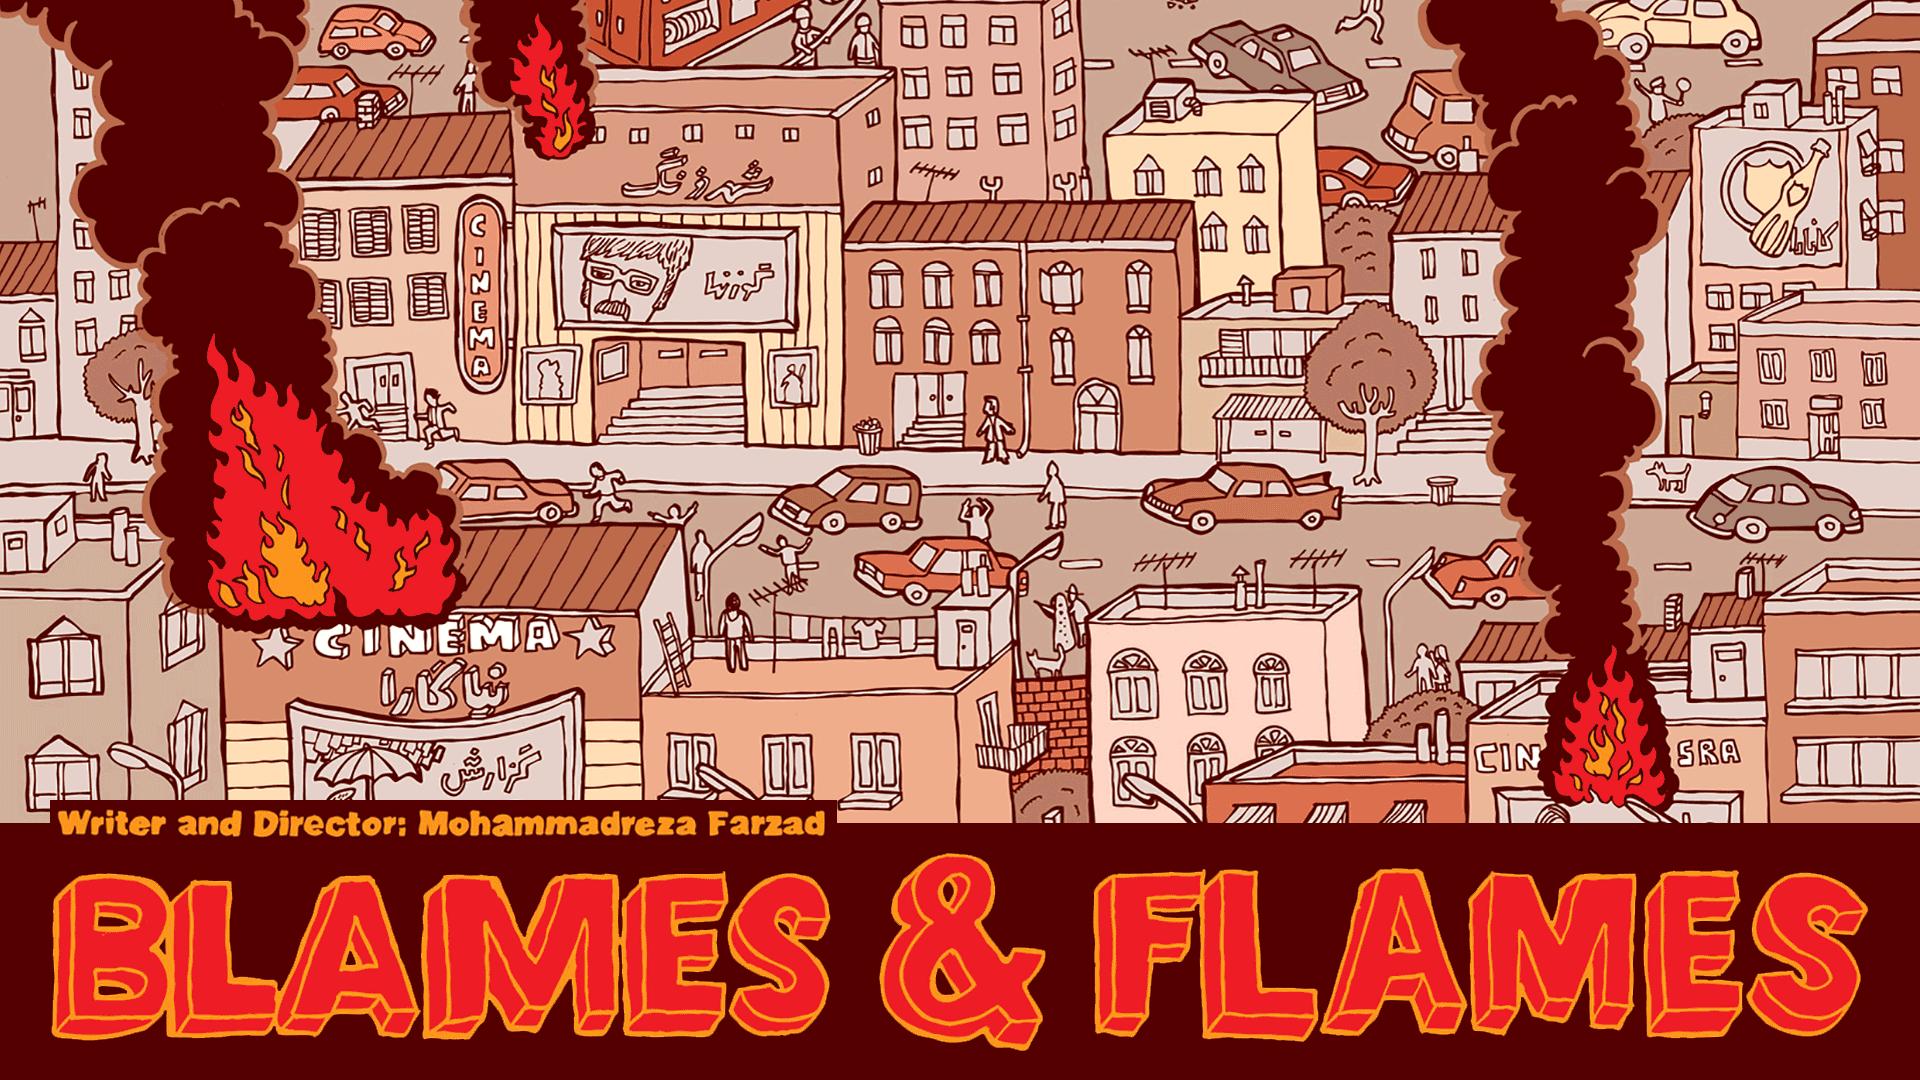 Blames & Flames (2012)